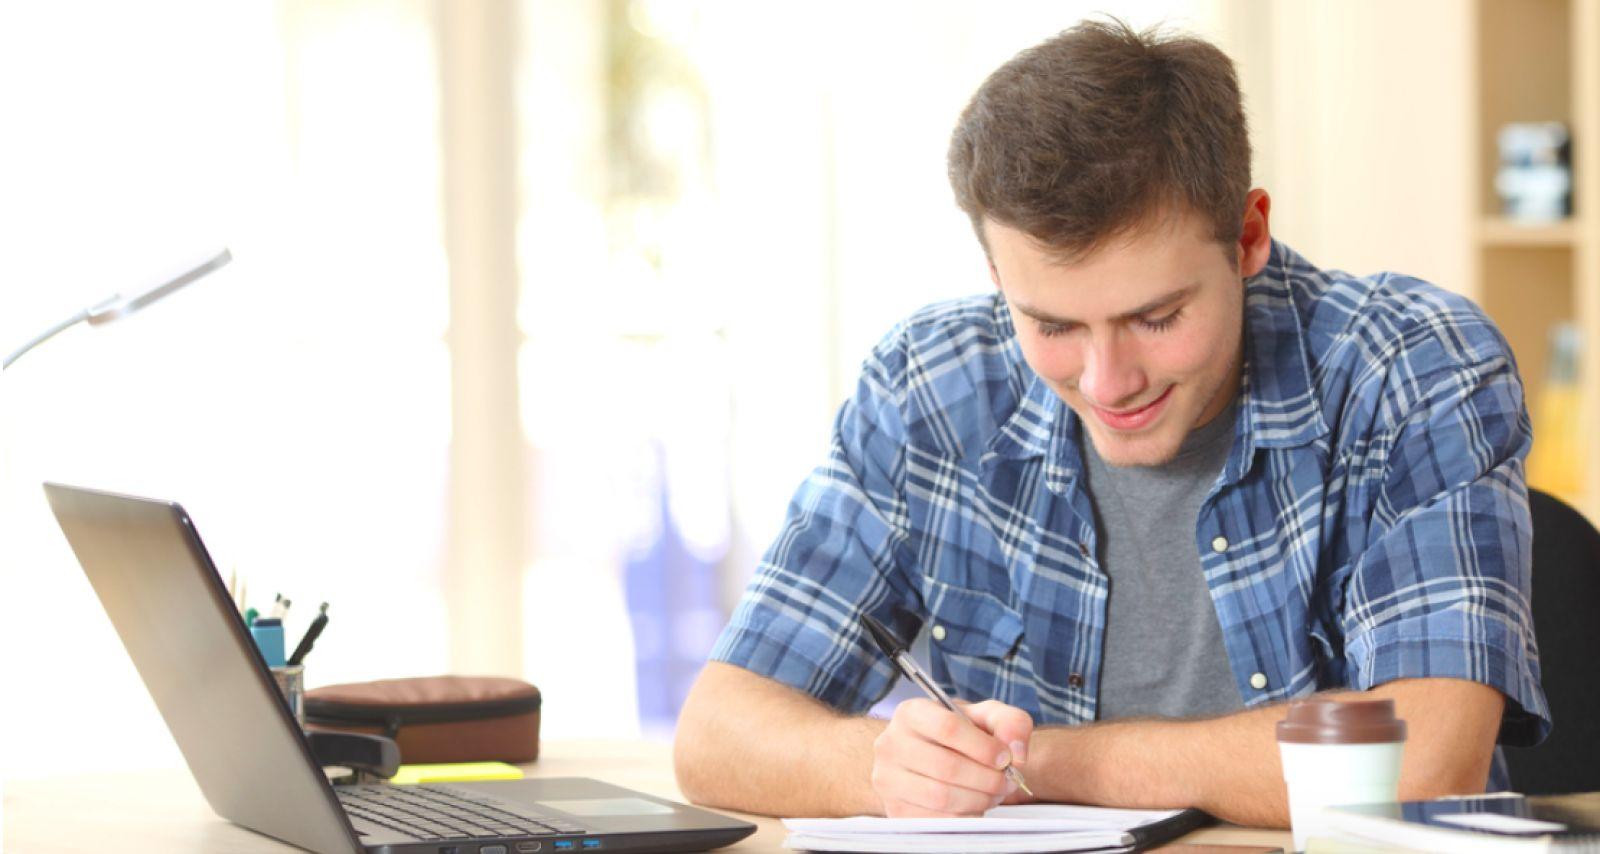 دوره آنلاین یادگیری لغت زبان